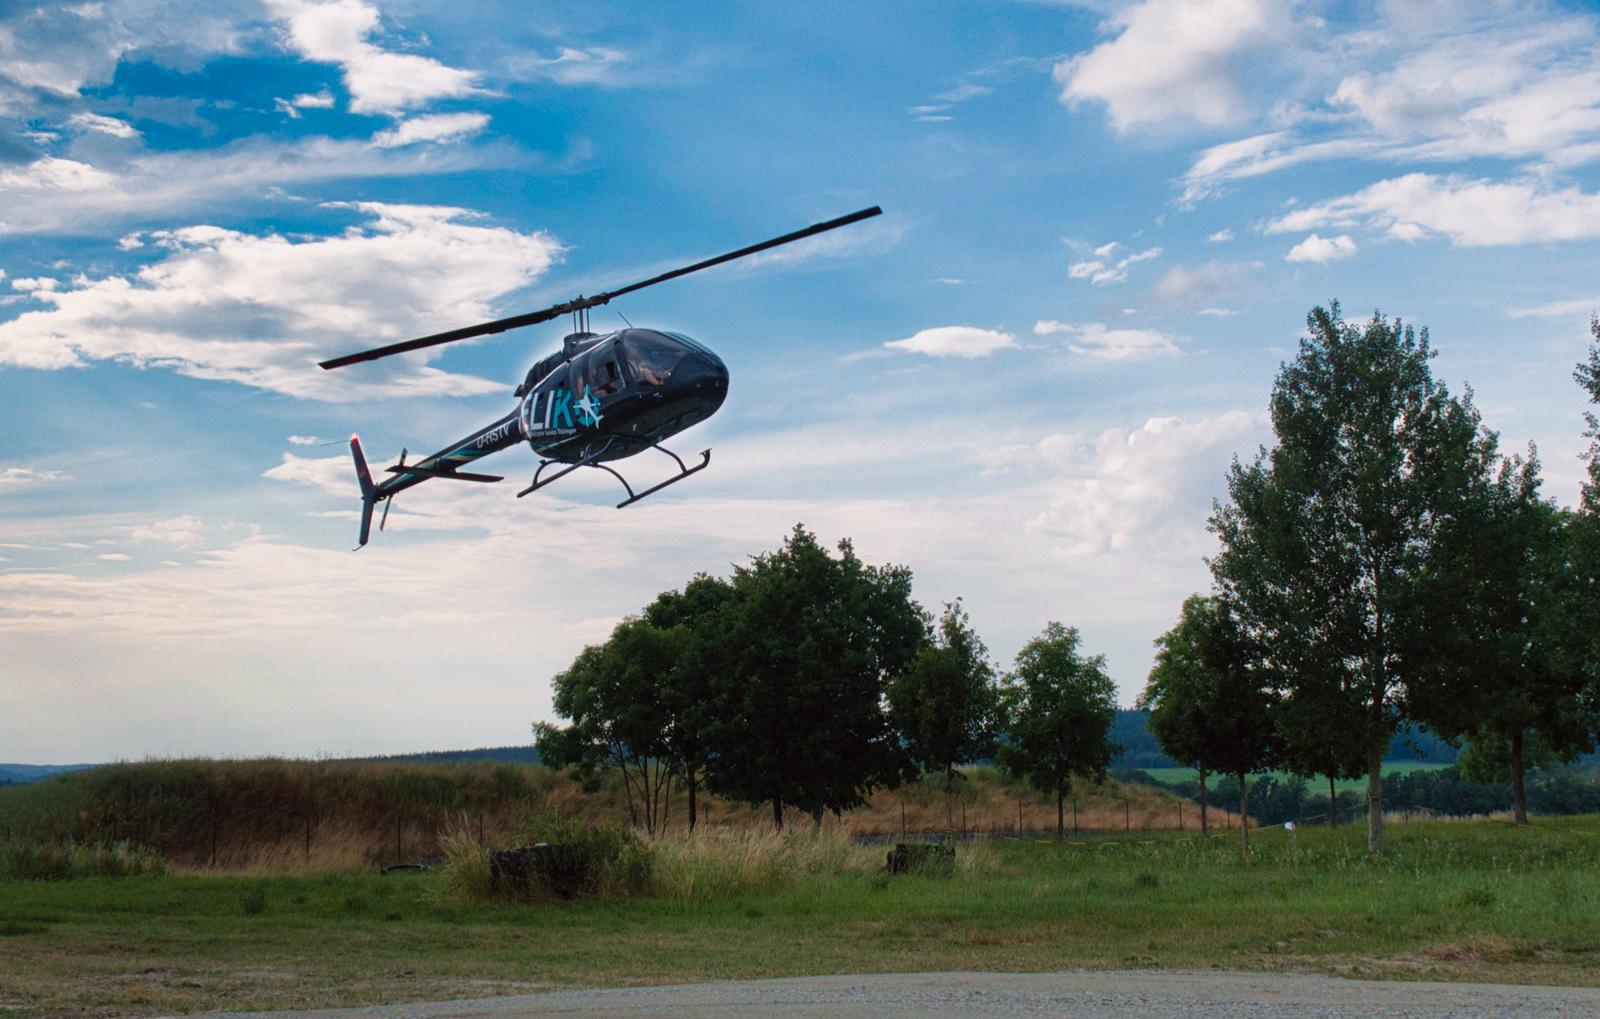 hubschrauber-rundflug-thueringer-wald-bg1